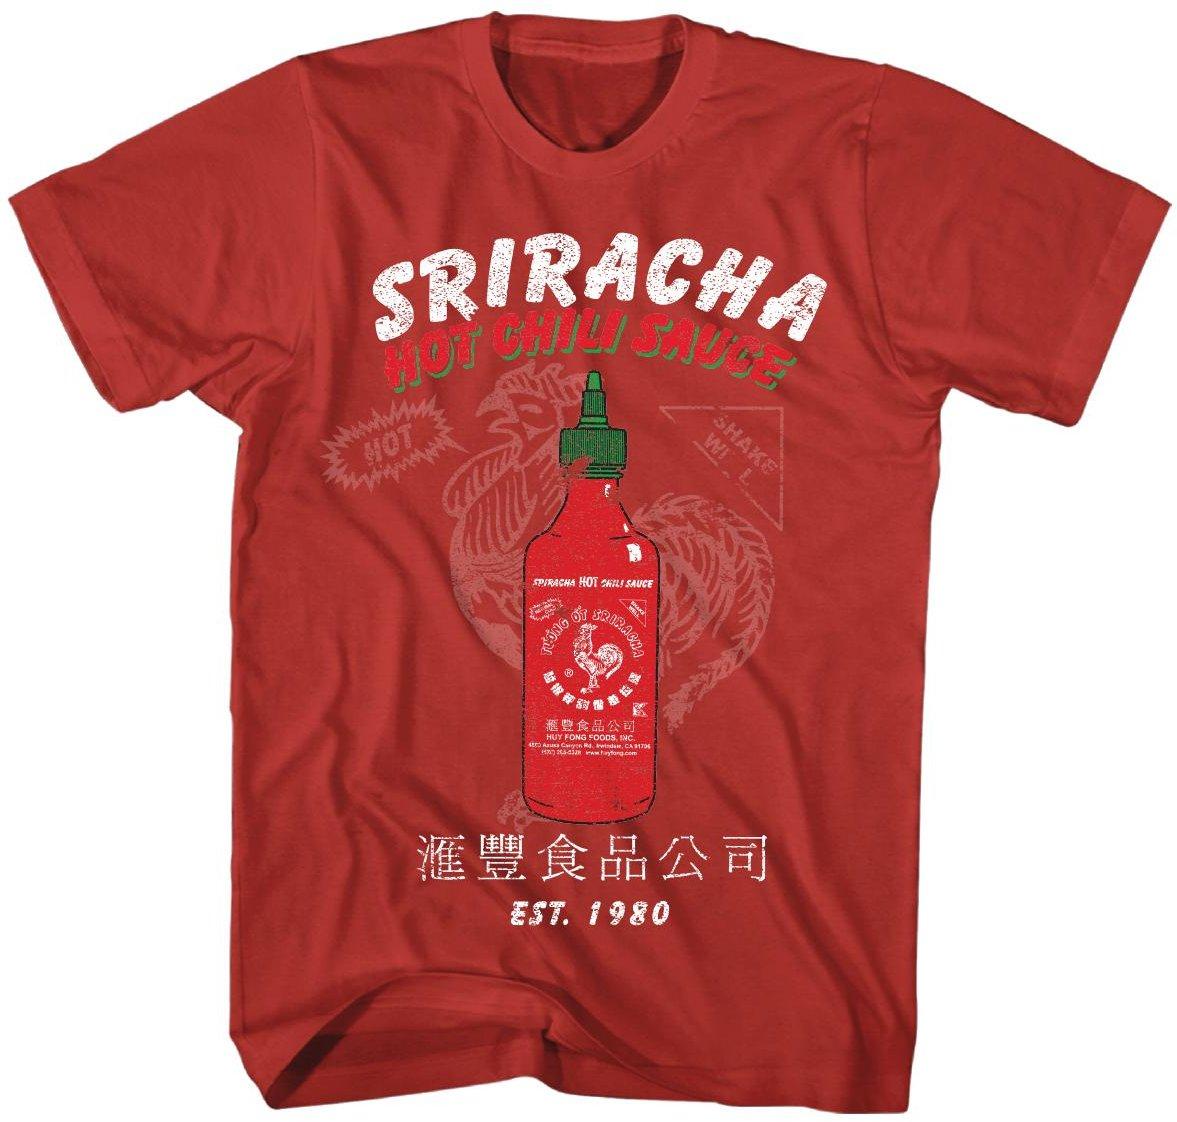 SRIRACHA / SOFT HAND SCREEN PRINT OVER RED / SHORT SLEEVE TEE